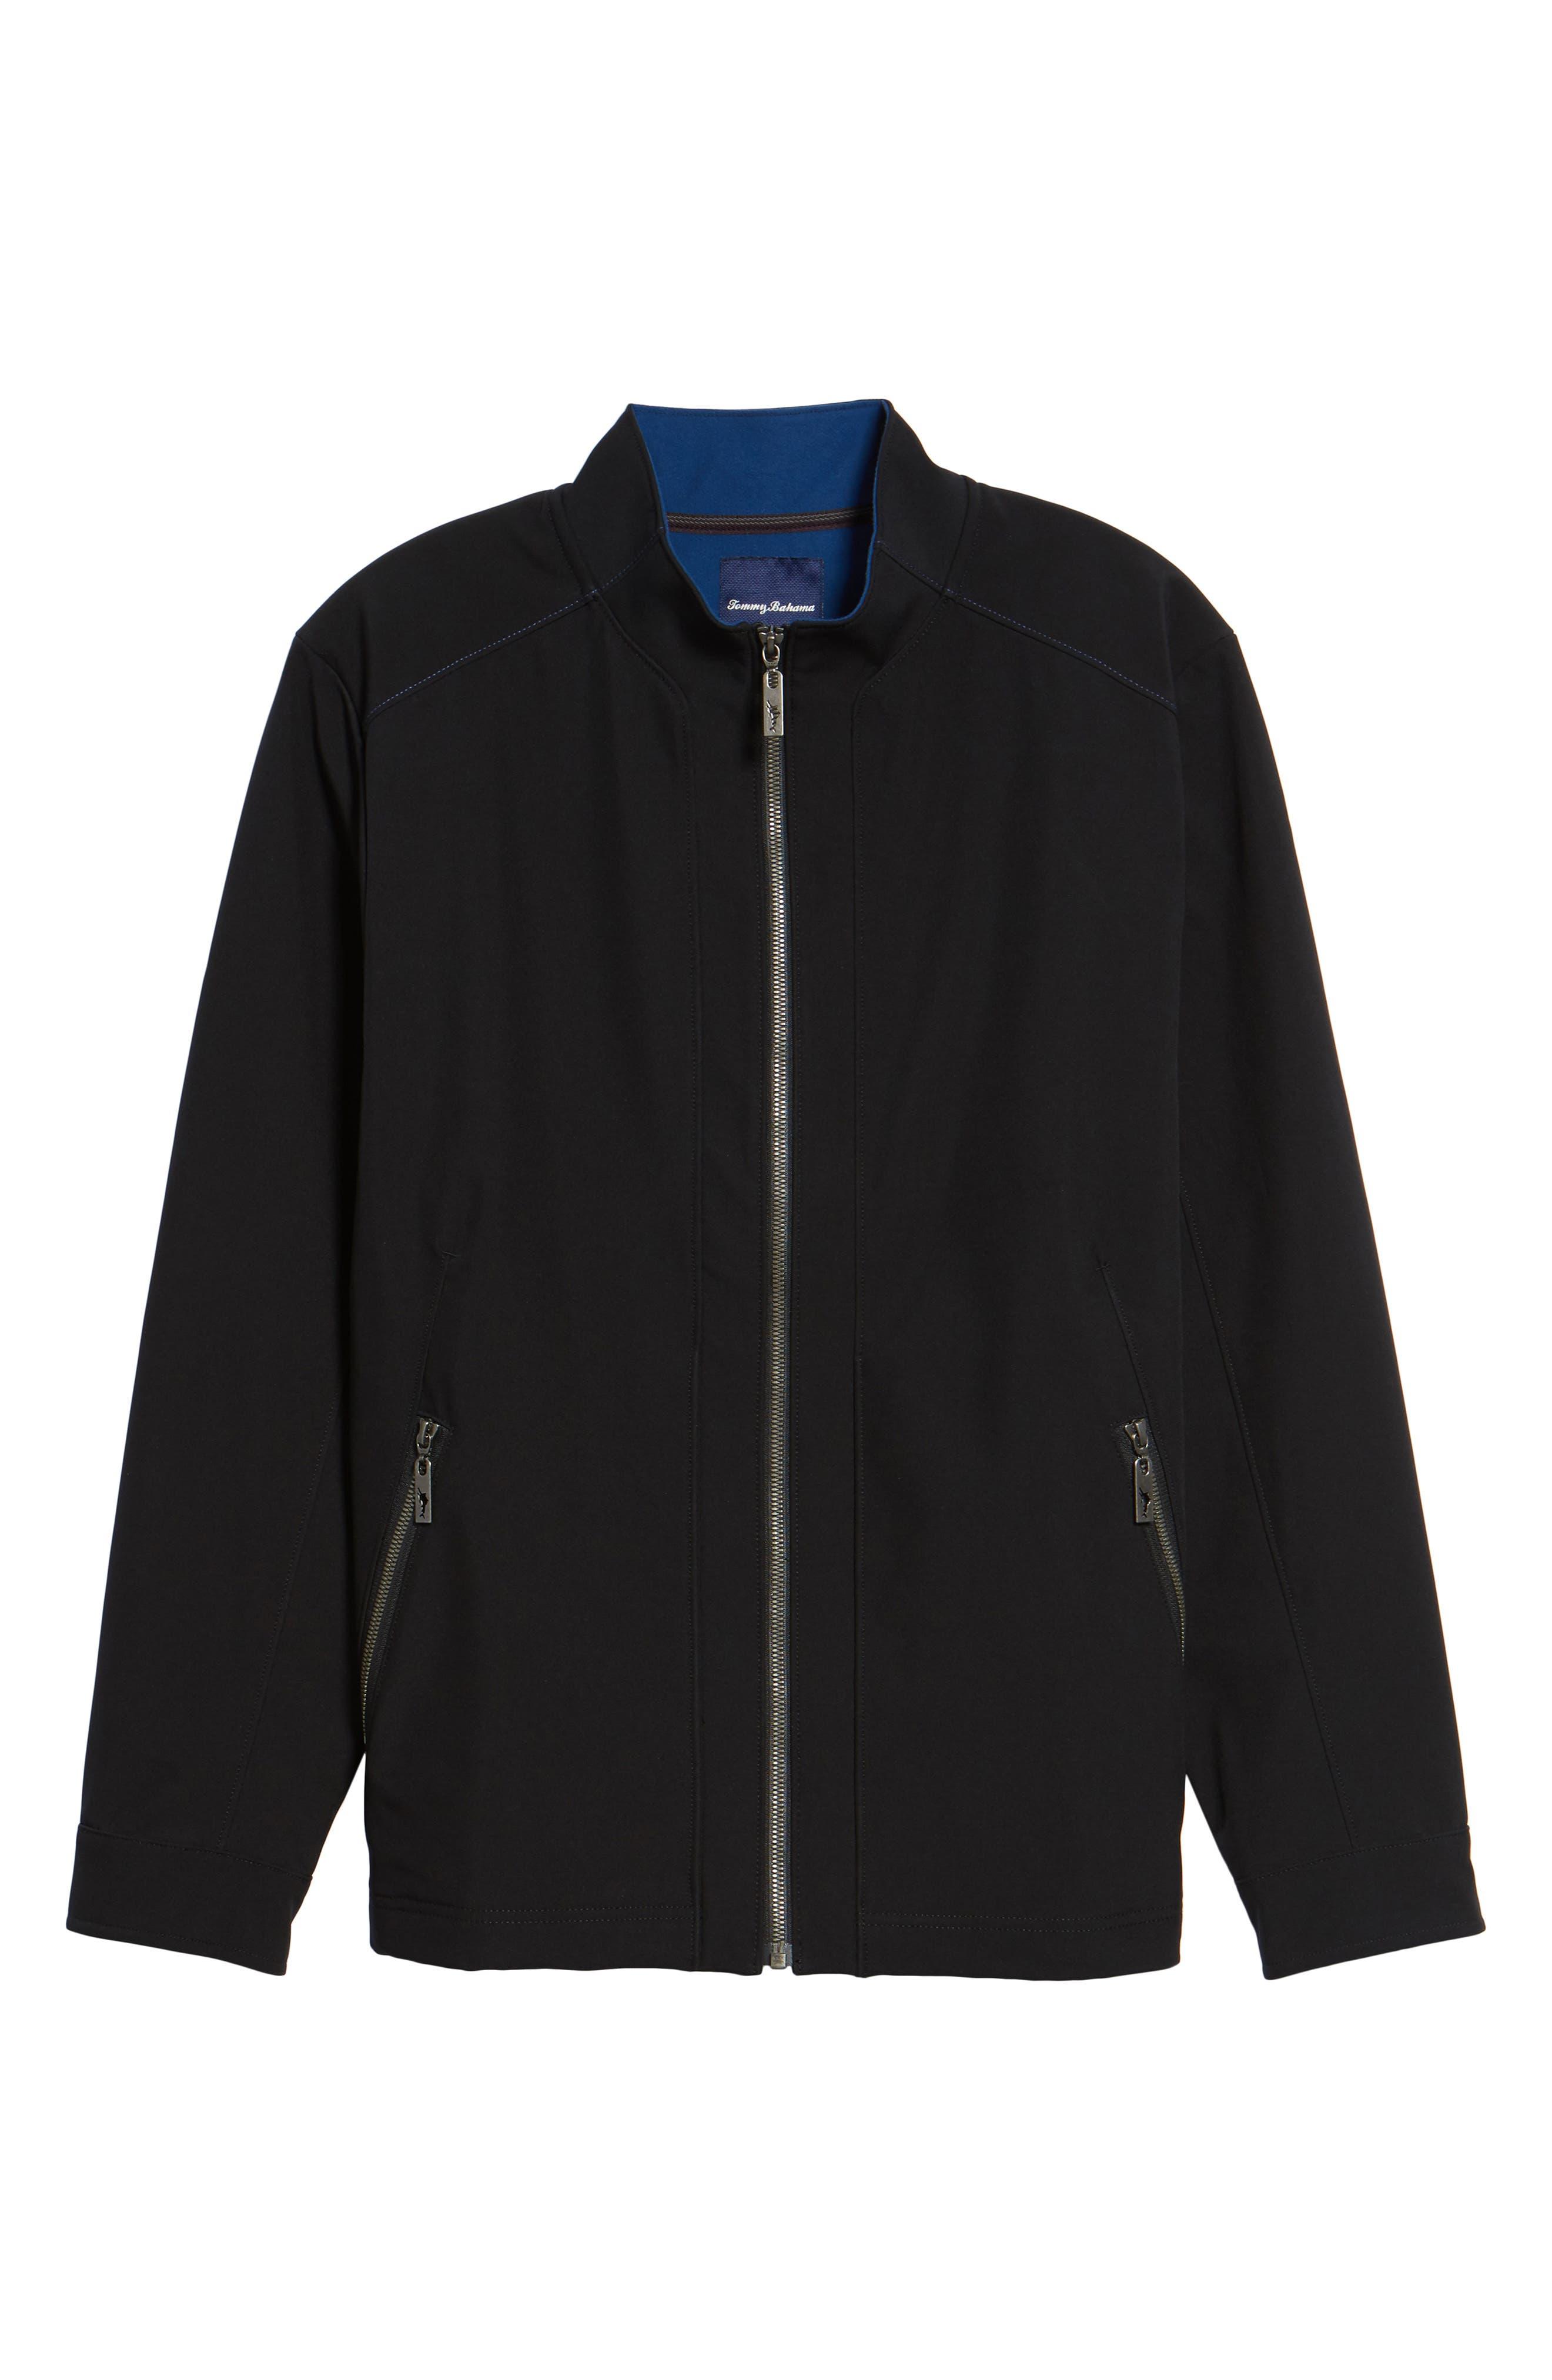 Downswing Zip Jacket,                             Alternate thumbnail 6, color,                             Black